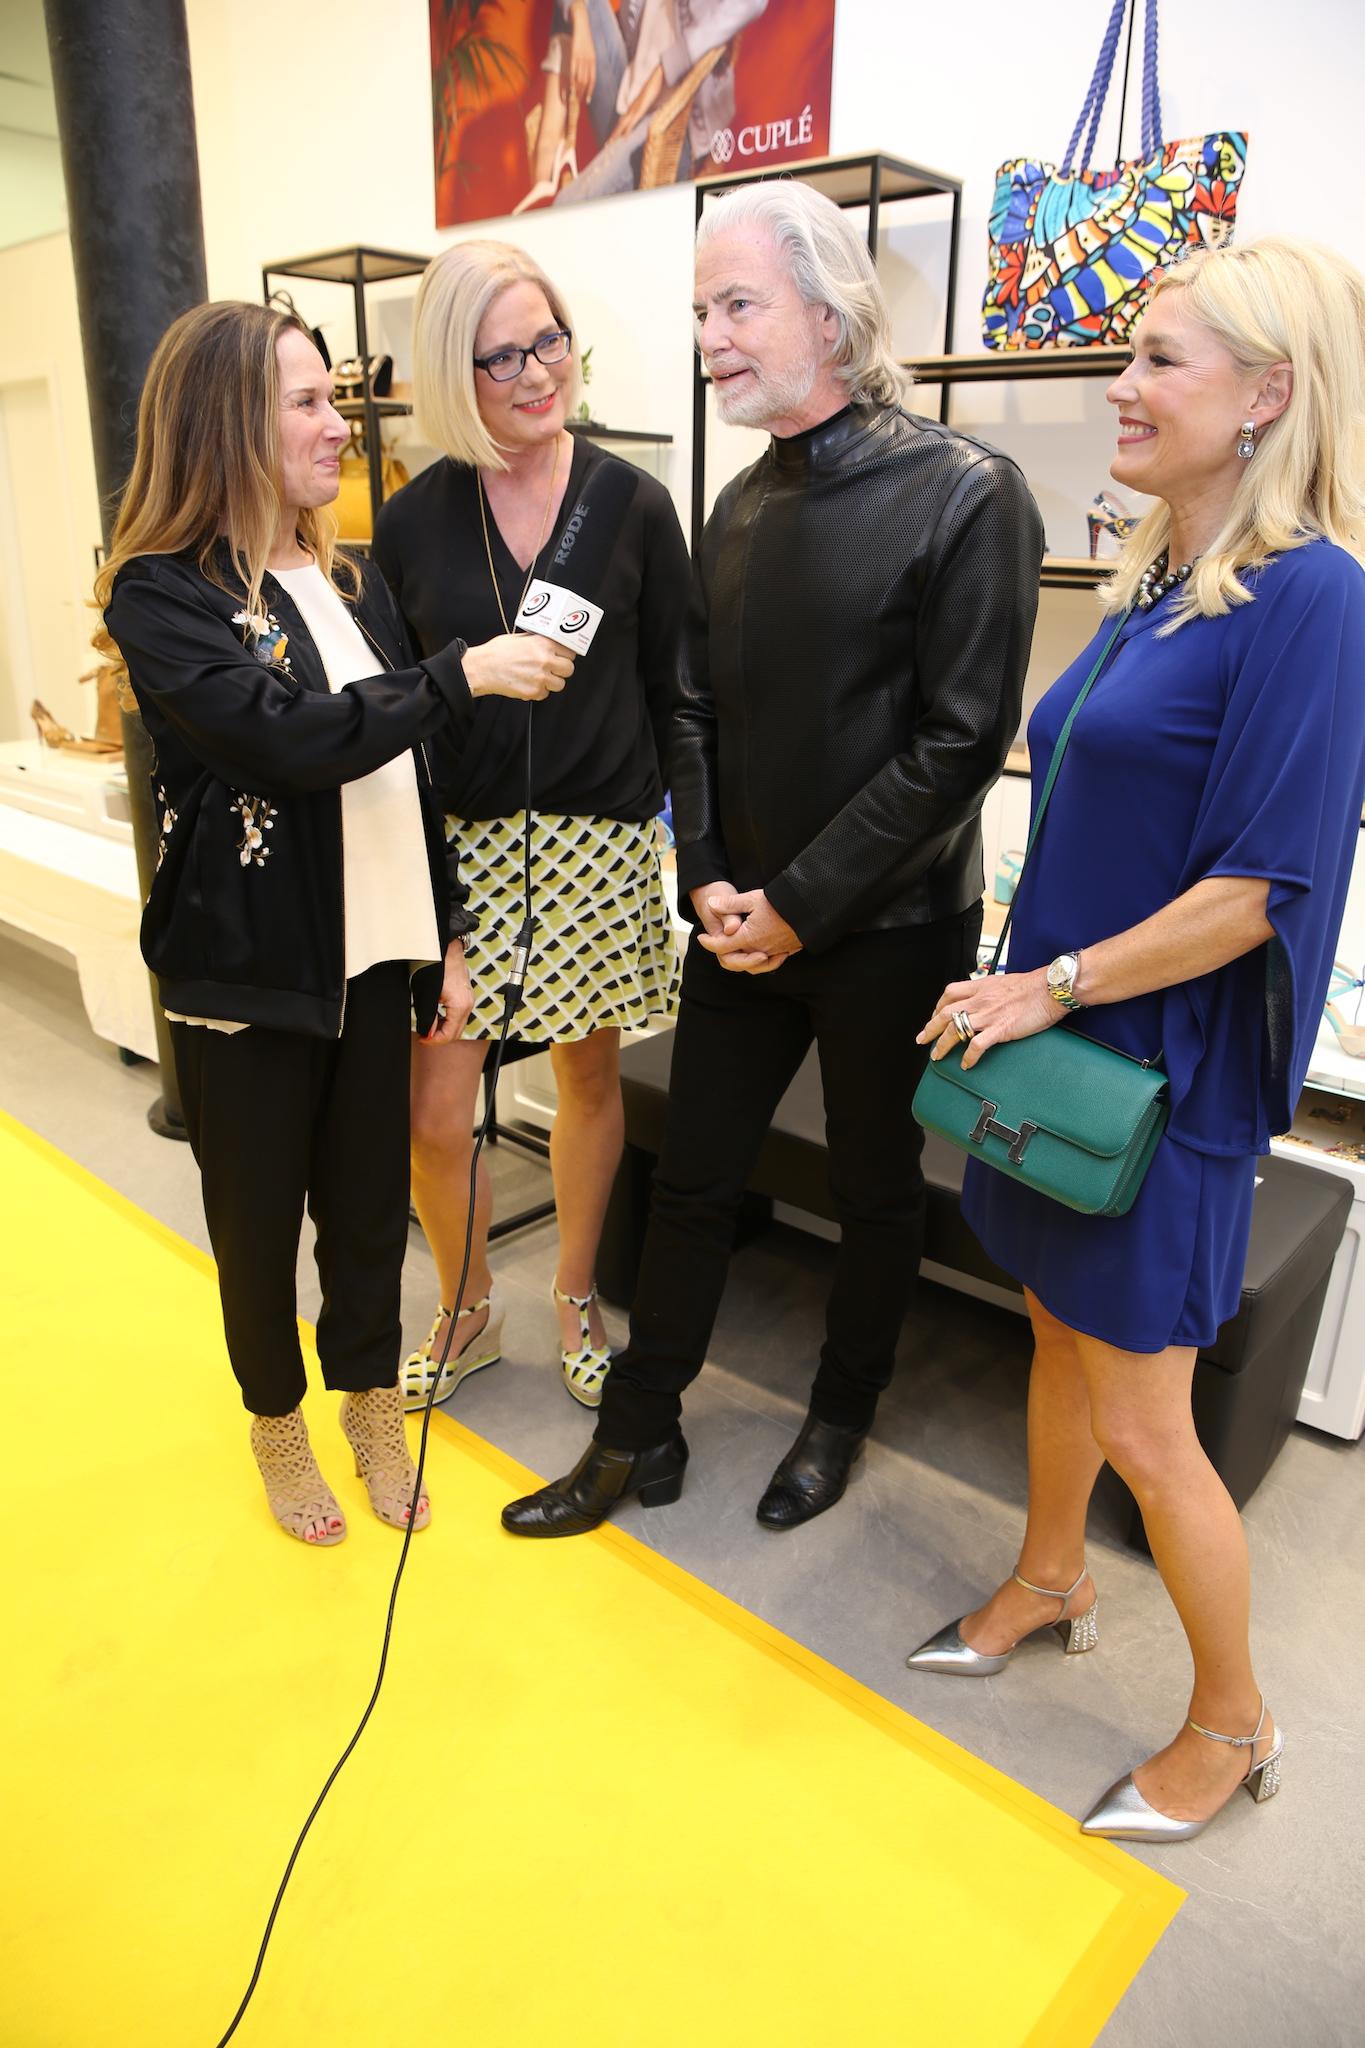 Martina Ullrich, Gudrun Garces, Hermann Bühlbecker, Petra Dieners, Cuplé Düsseldorf, Fashion-Blog, Lieblingsstil.com,1,